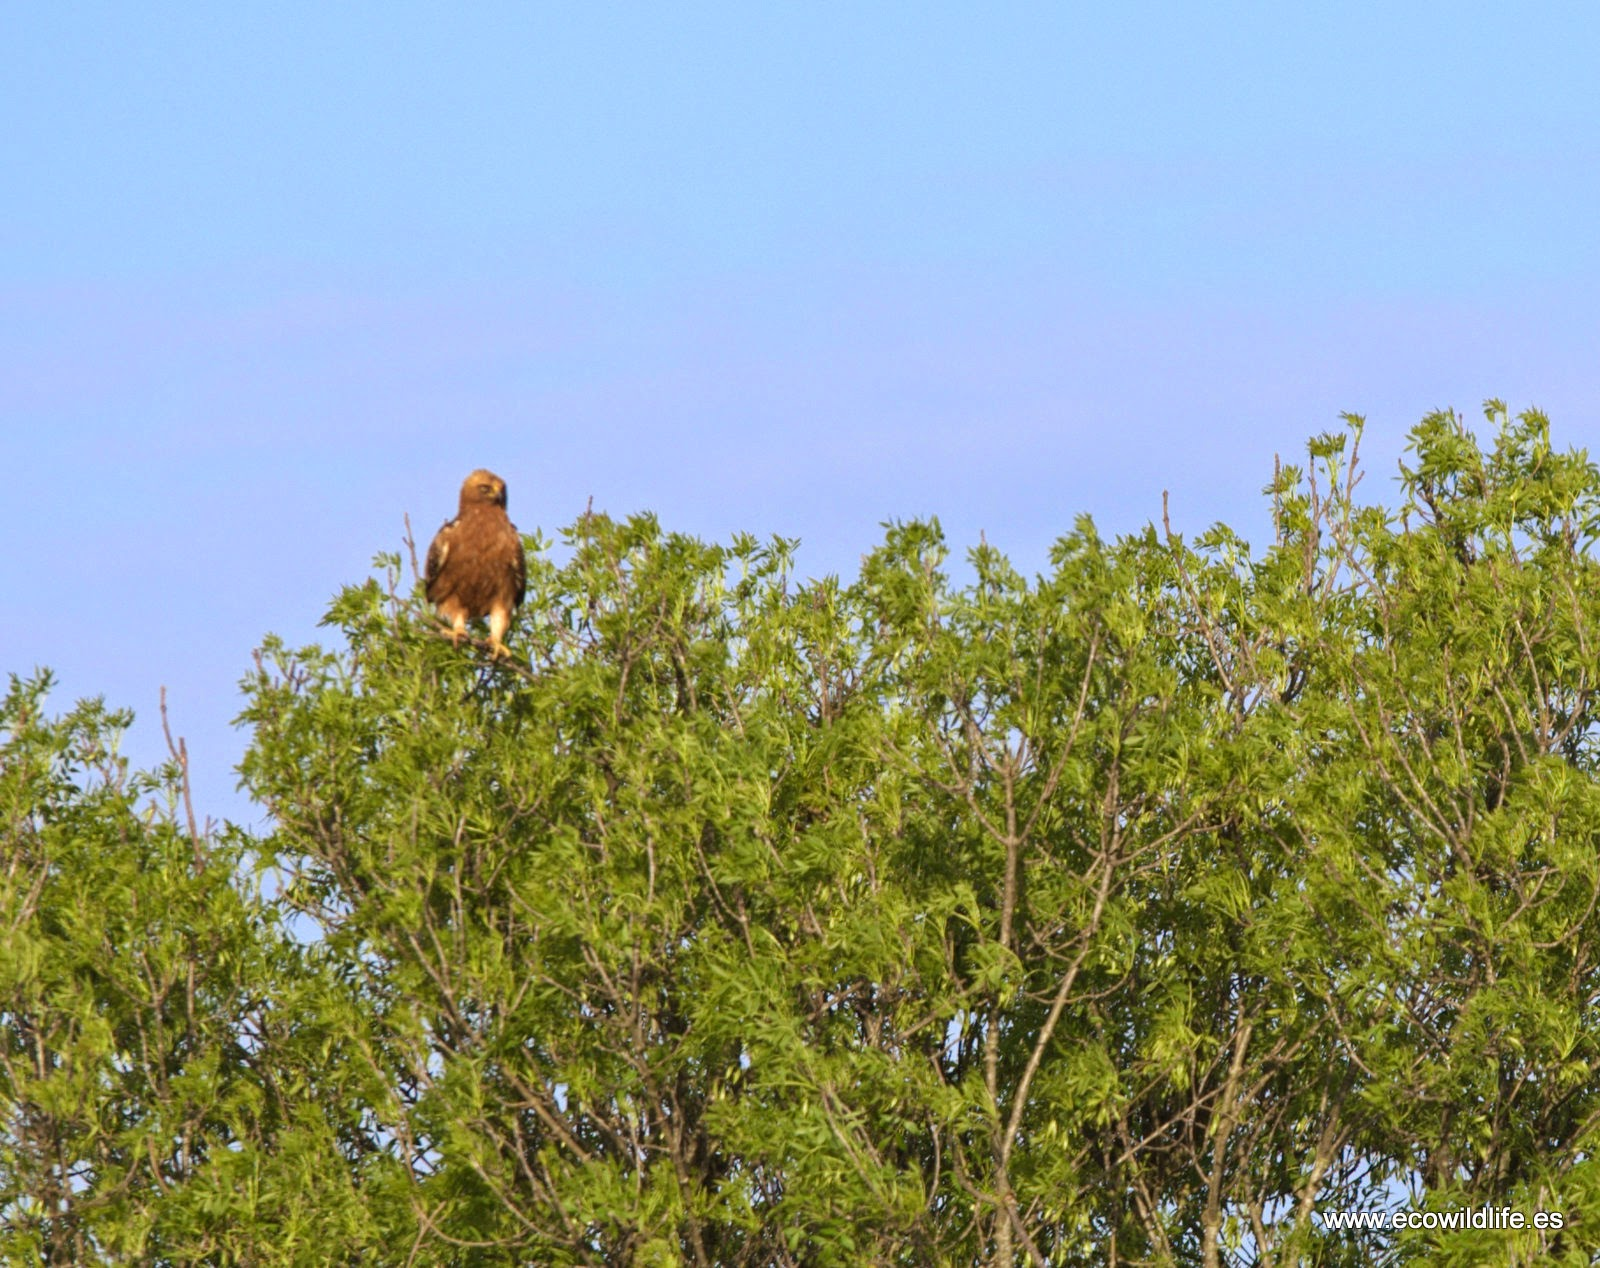 natural sitio de citas pequeño cerca de Huelva